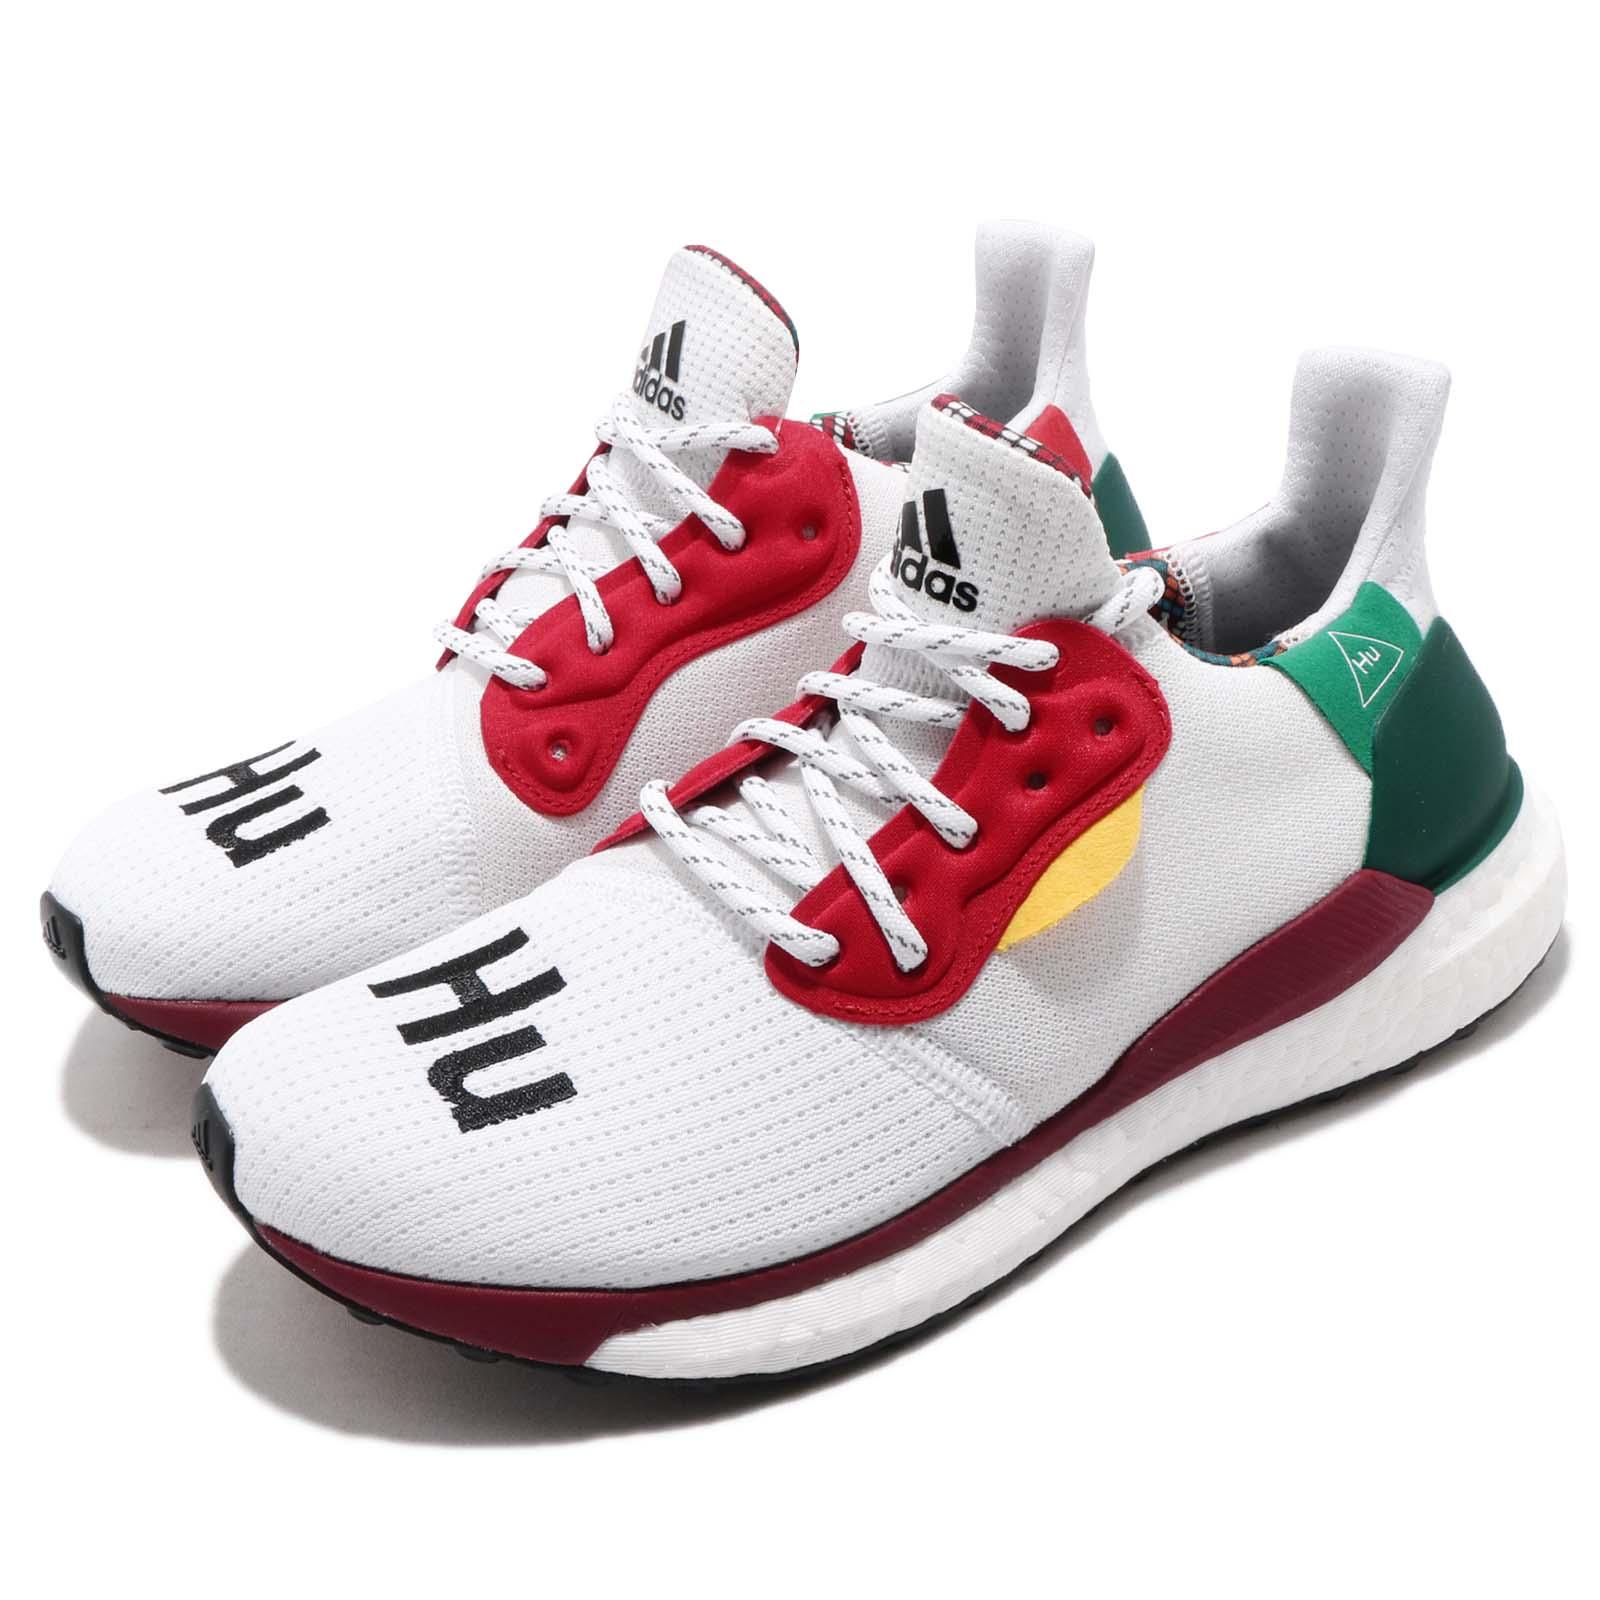 adidas 慢跑鞋 Solar HU Glide 運動 女鞋 CG6776